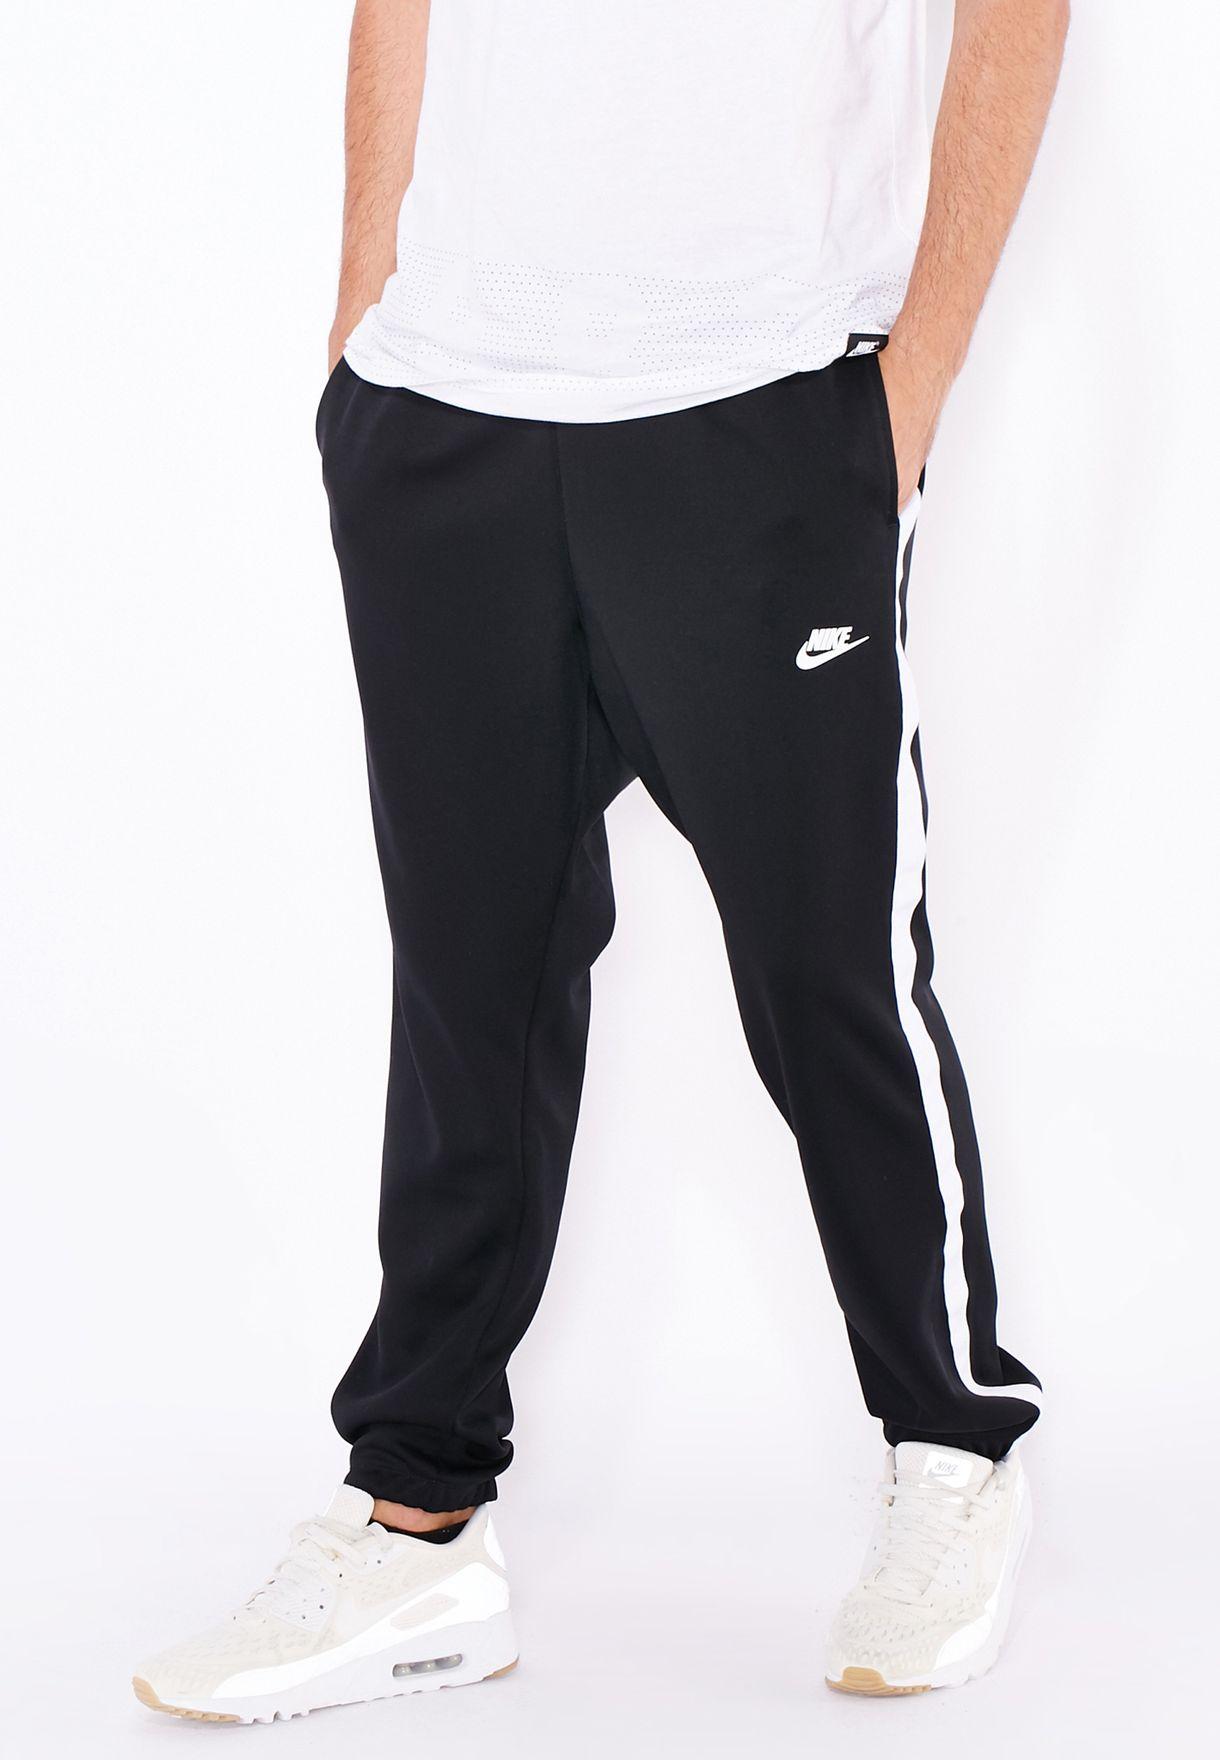 dcb561ffdc52 Shop Nike black Tribute Track Pants 678637-010 for Men in Oman ...